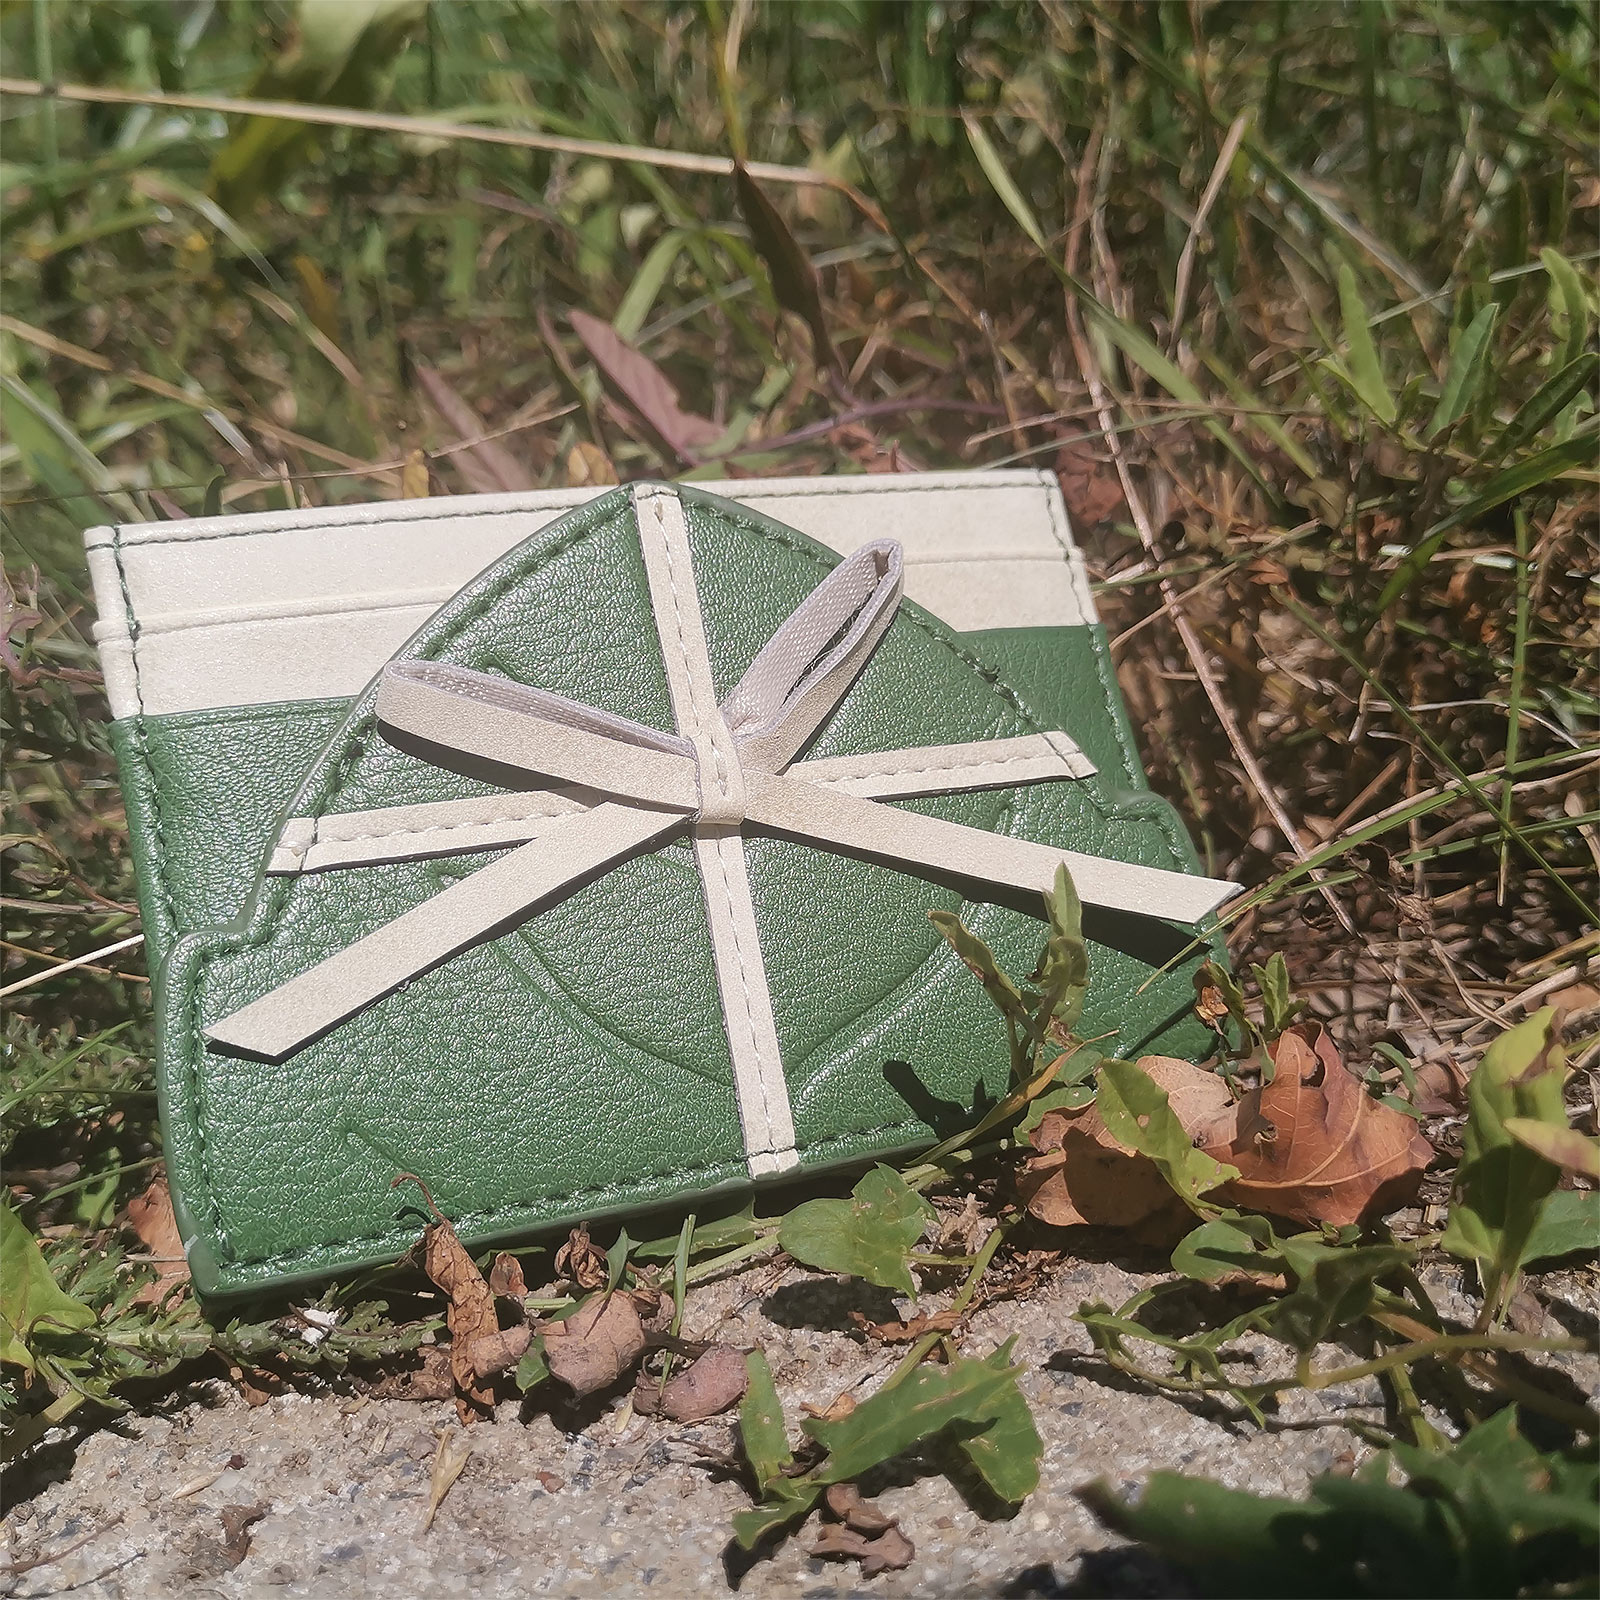 Herr der Ringe - Lembas Mini Geldbörse